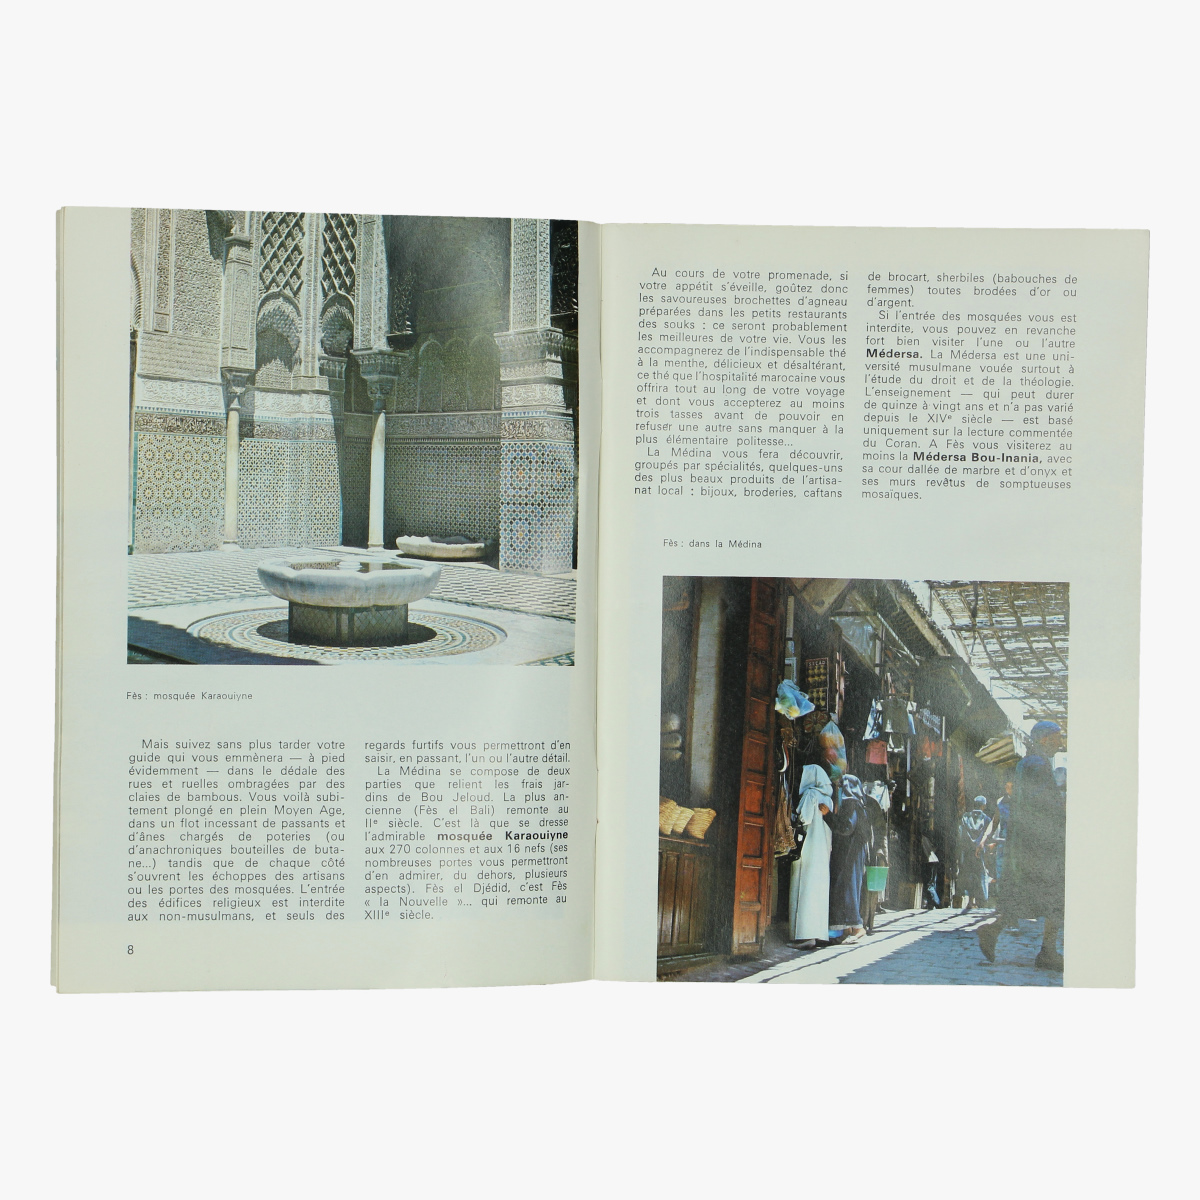 Afbeeldingen van sabena magazine 1970 maroc - tunise